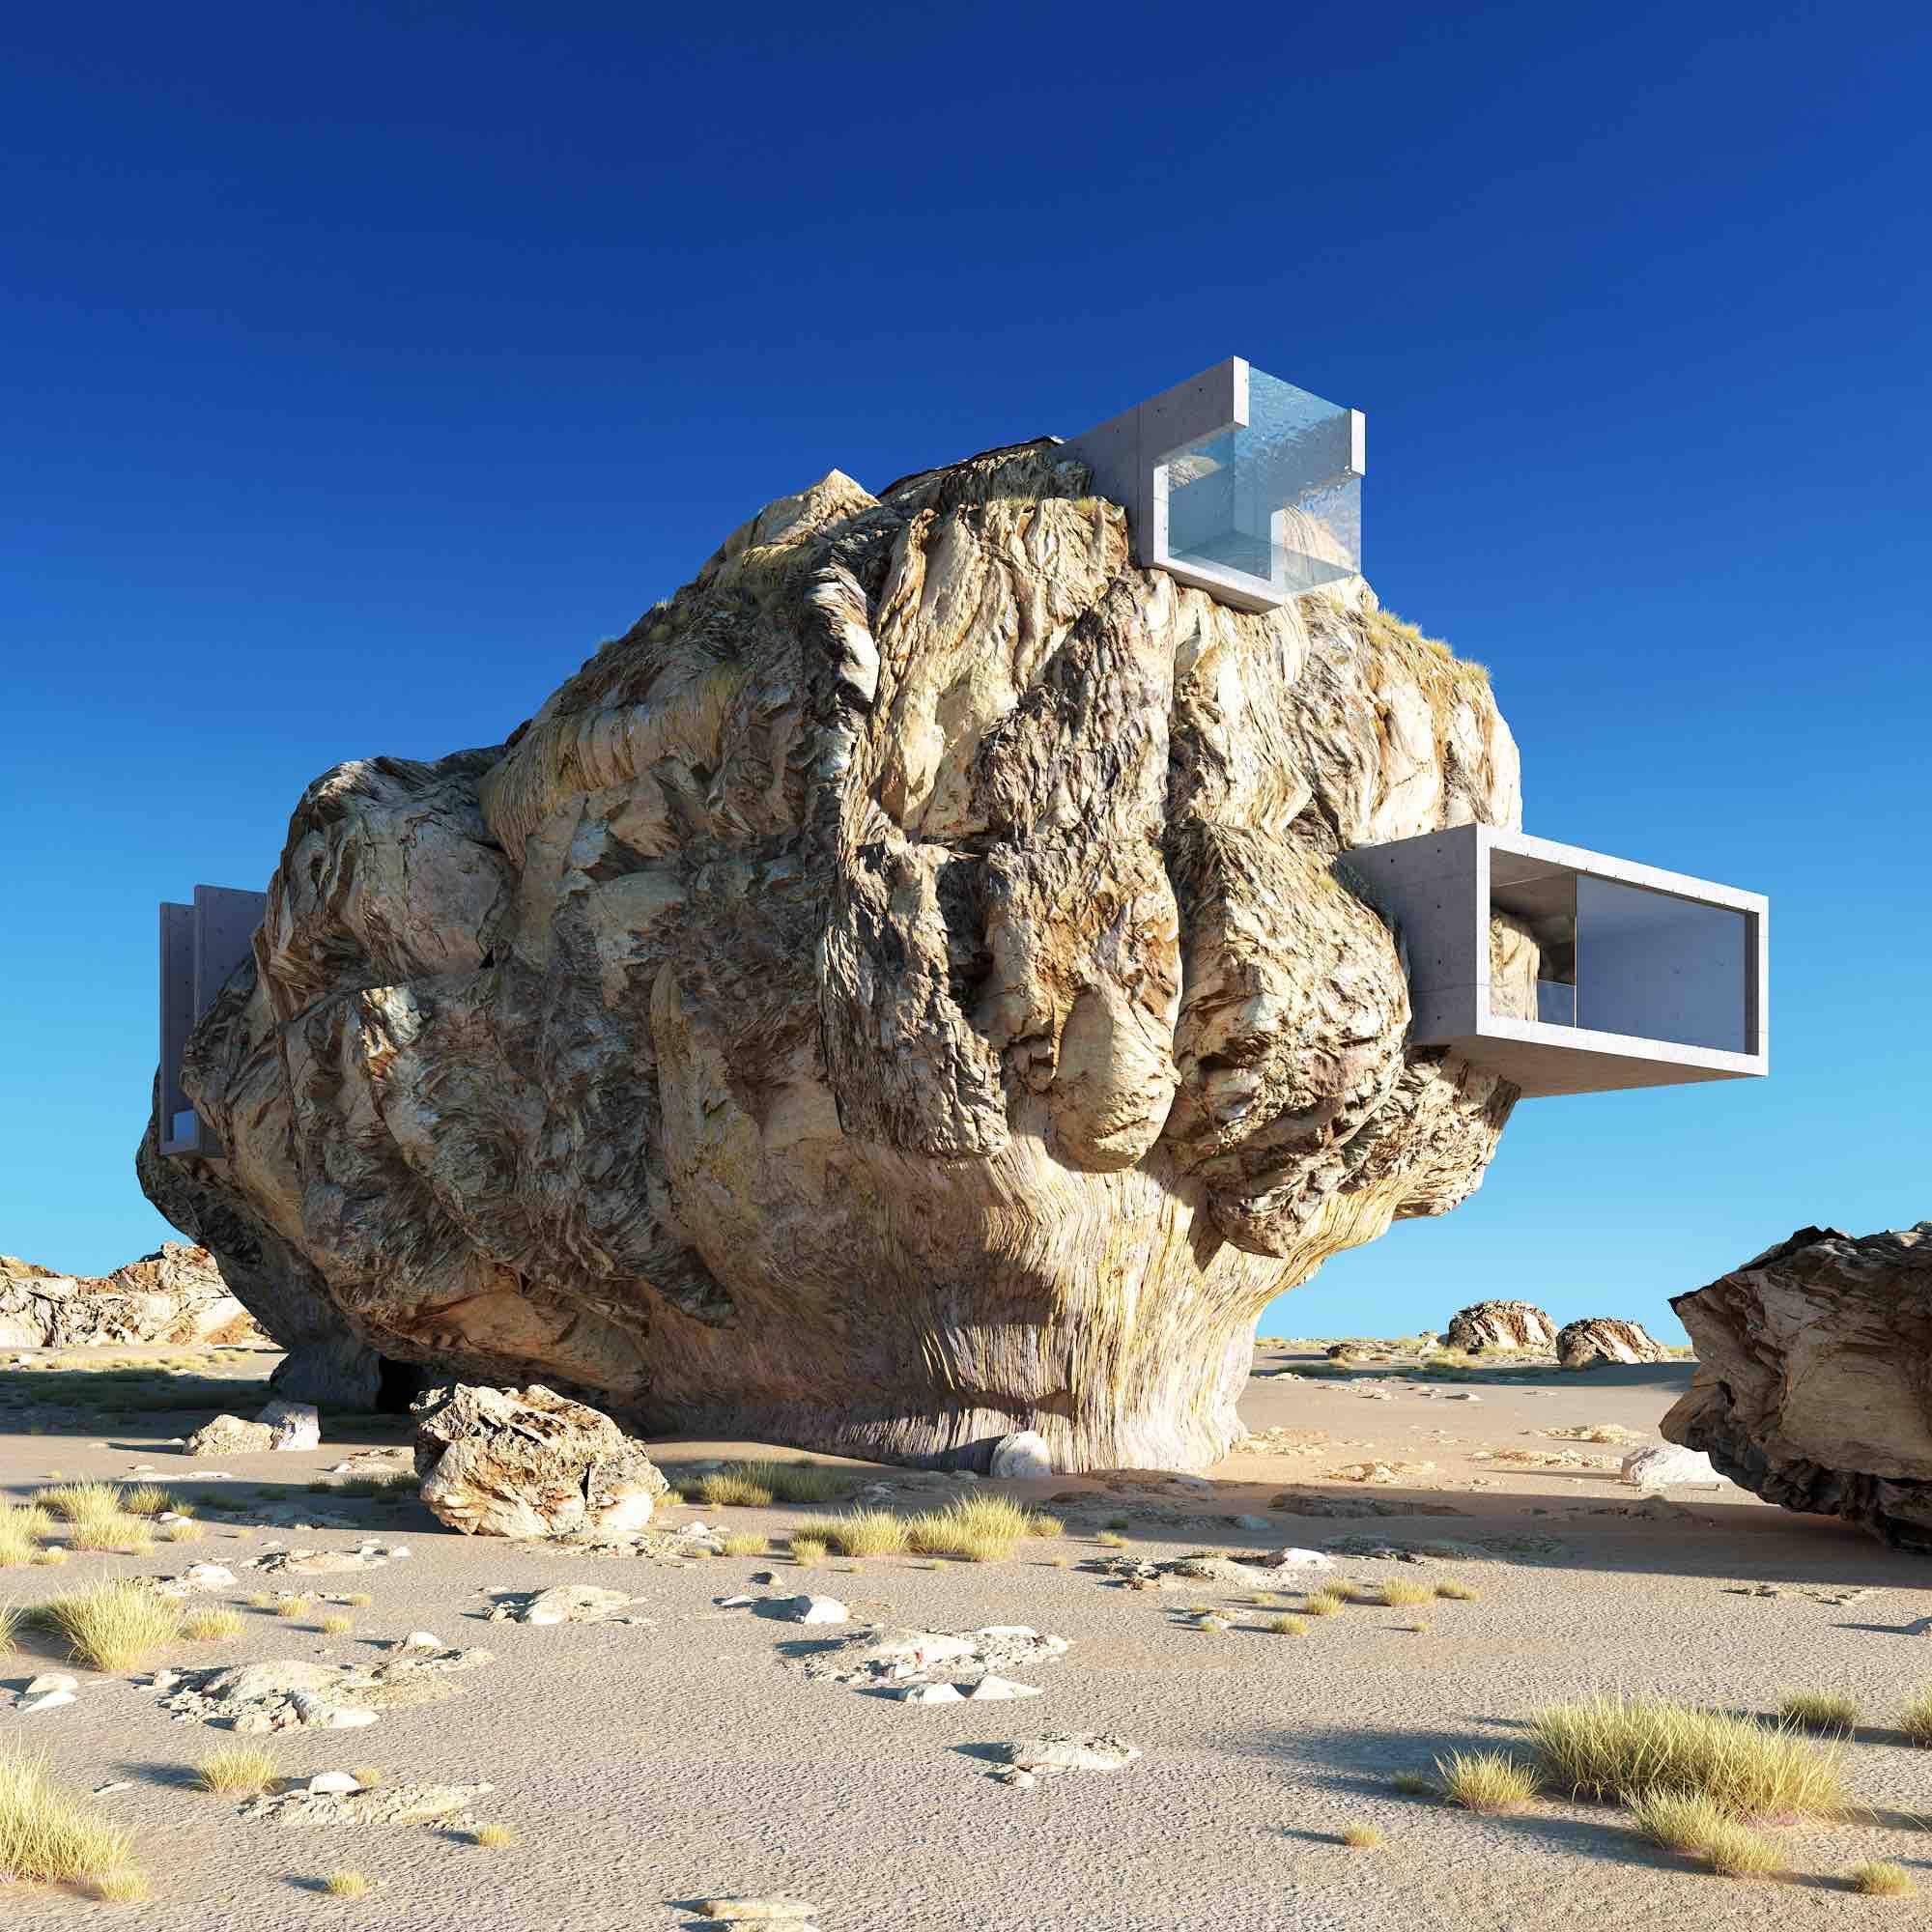 House-inside-a-rock-Amey-Kandalgaonkar-SaudiArabia-005.jpg